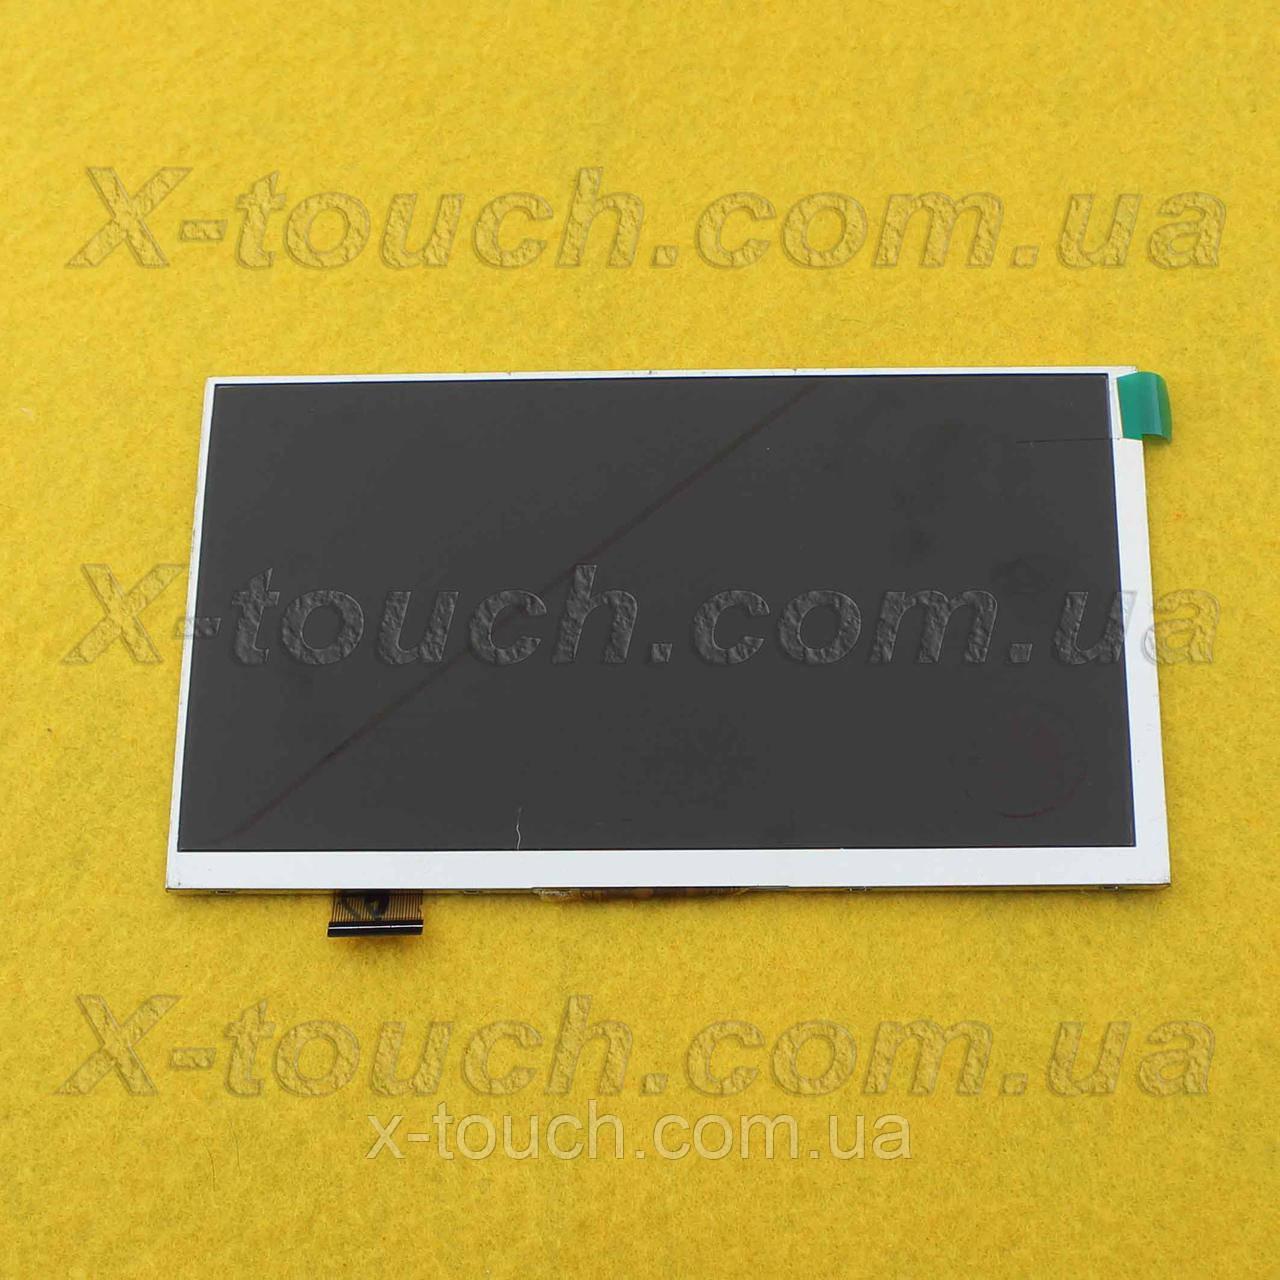 Матрица,экран, дисплей C0702630FPCI-1 для планшета